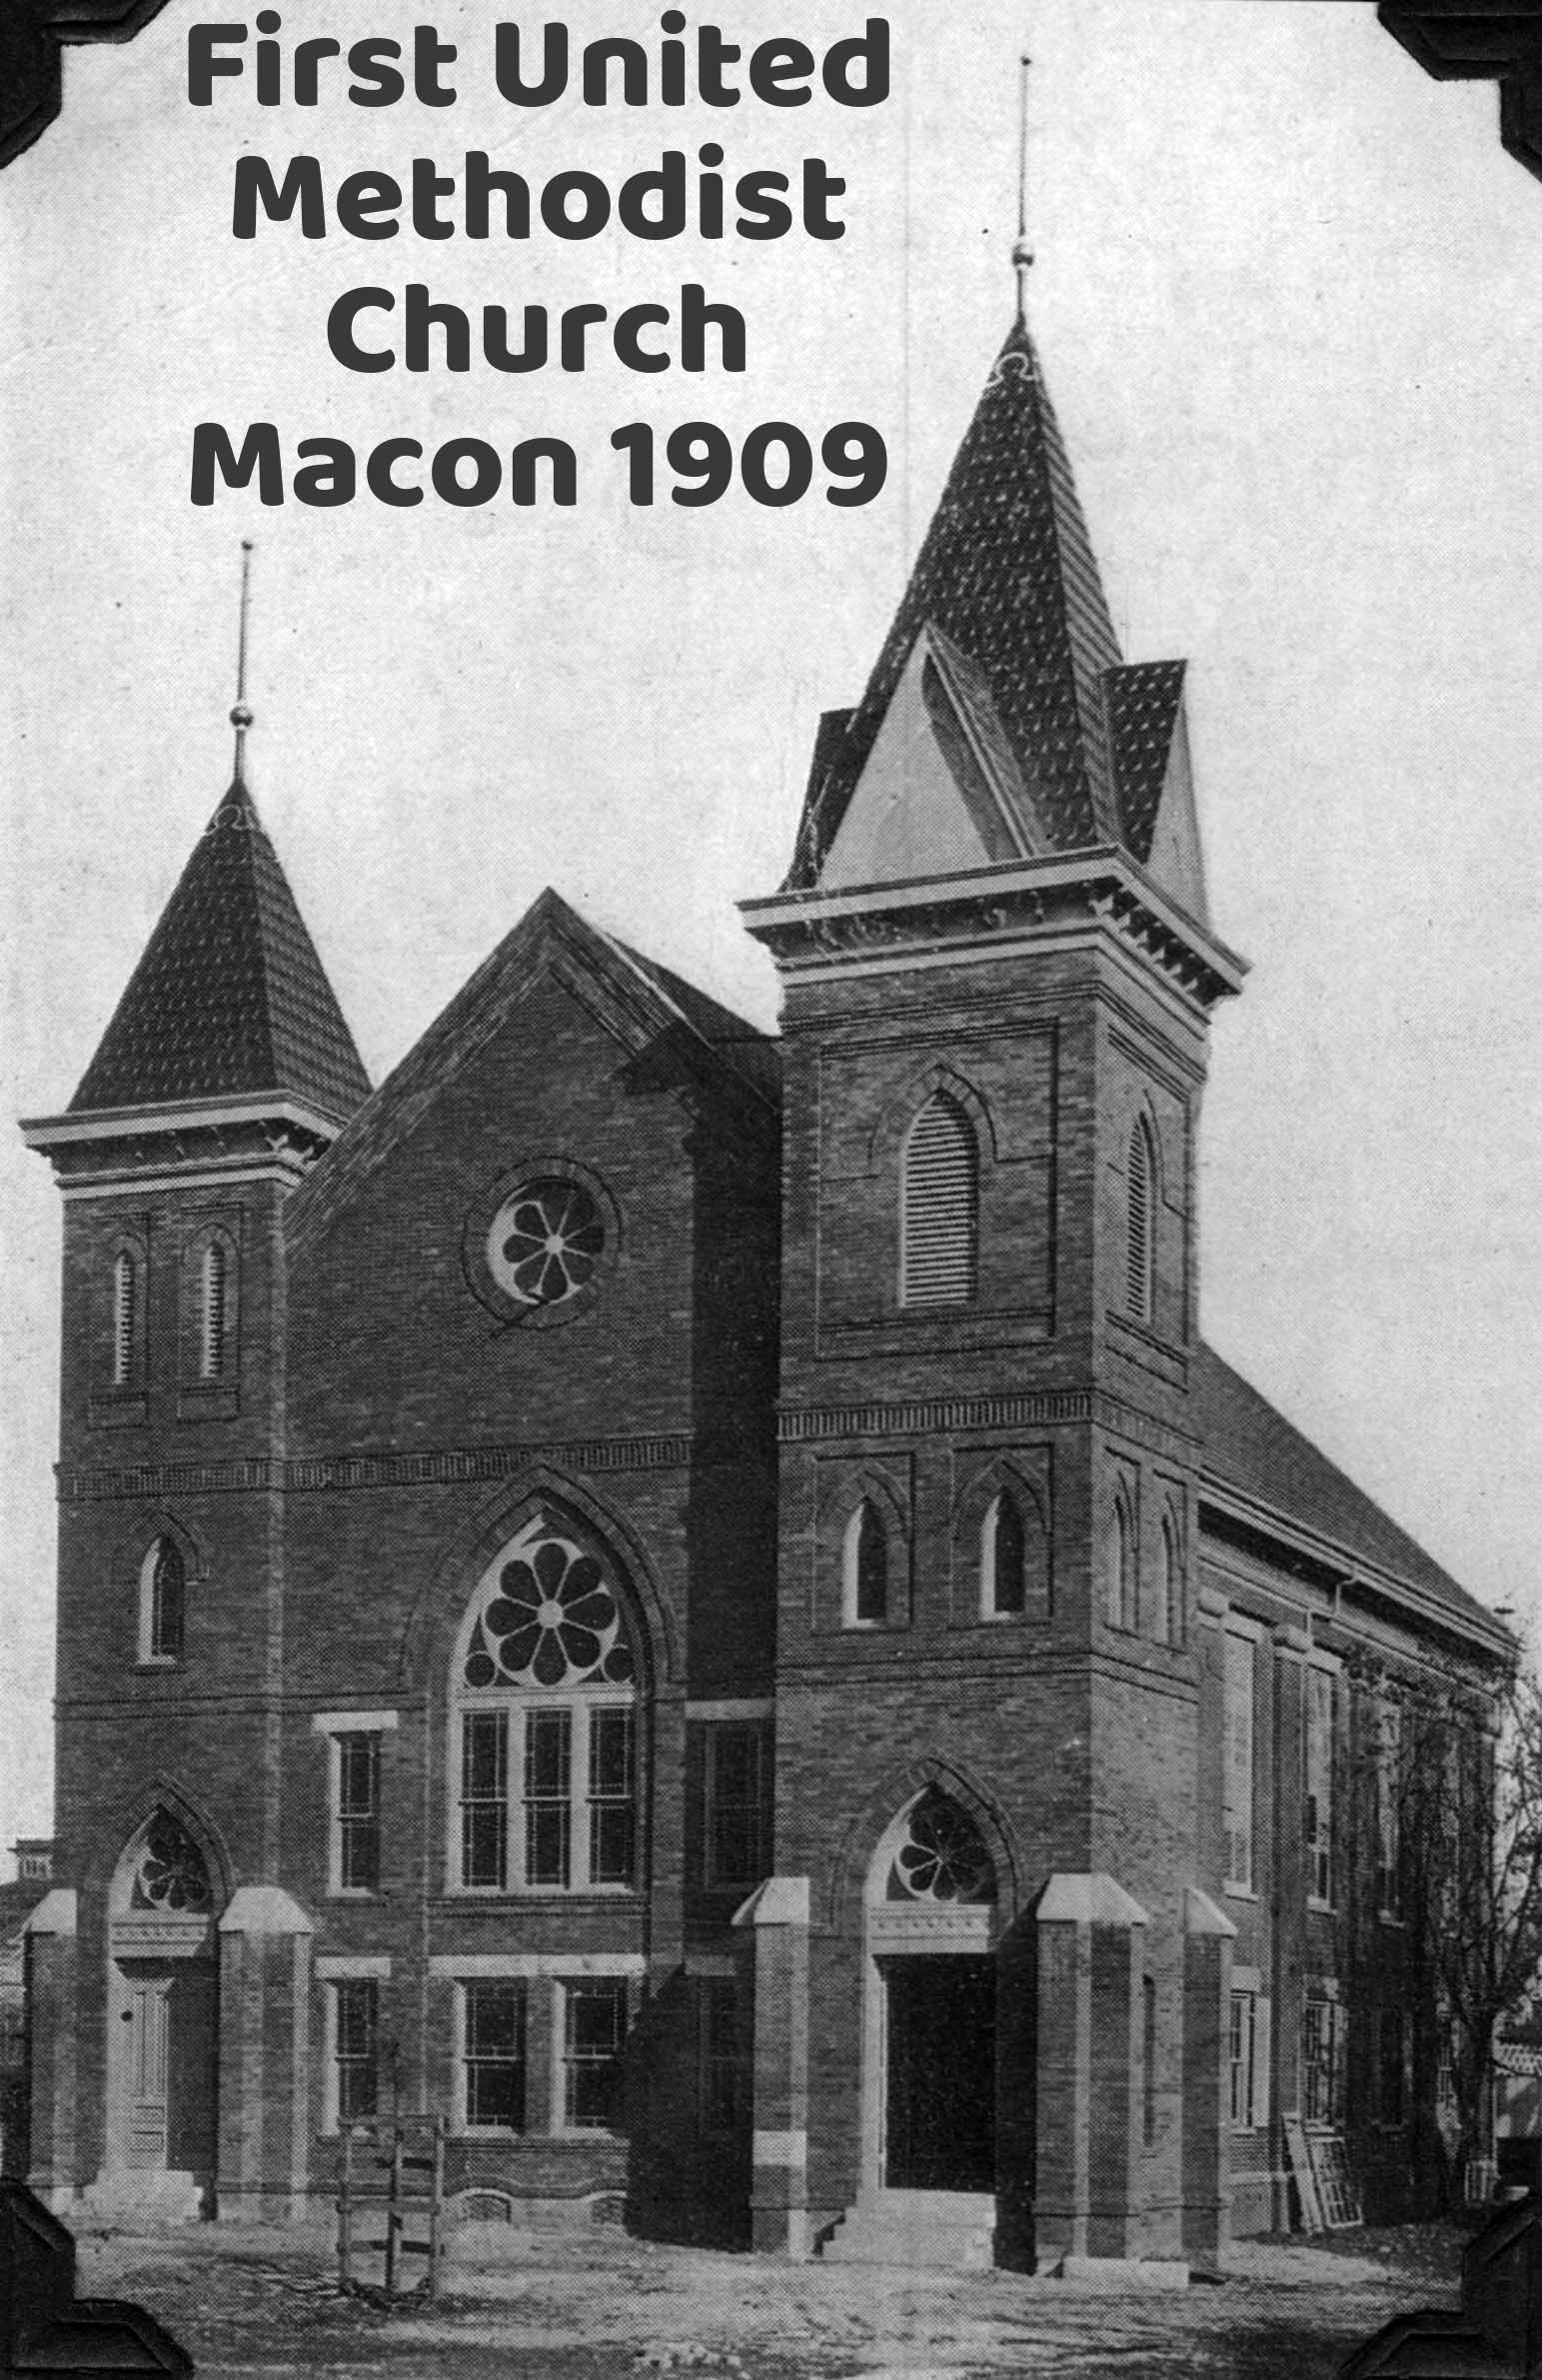 First United Methodist Church - Macon, Mississippi - 1909